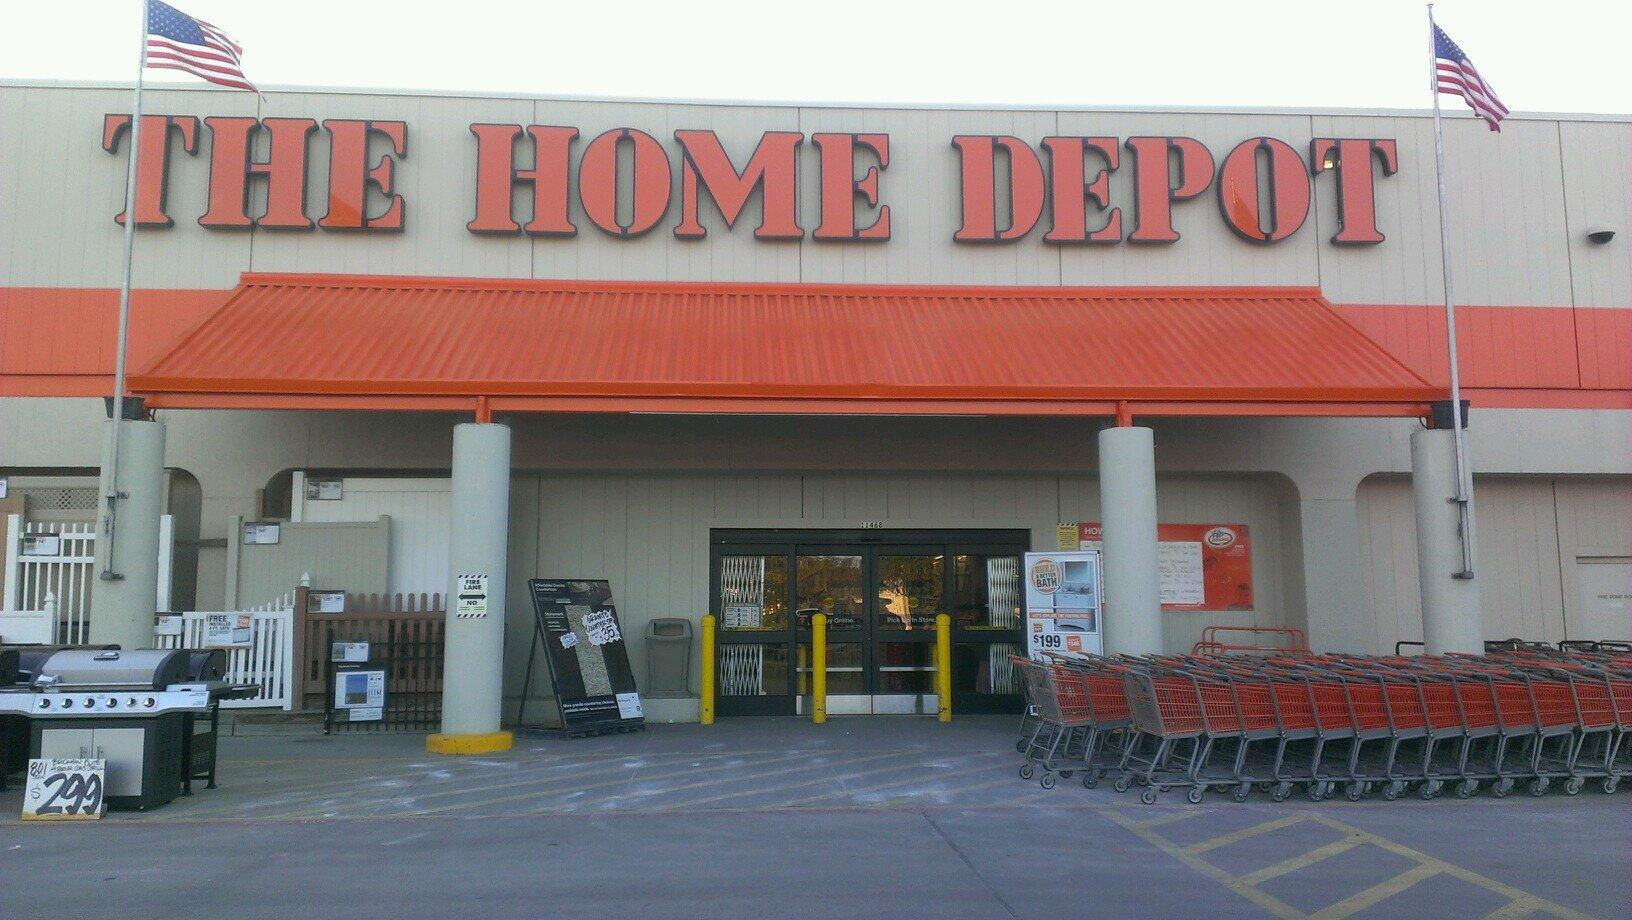 Nw Dallas Home Depot Nwdallashd Twitter